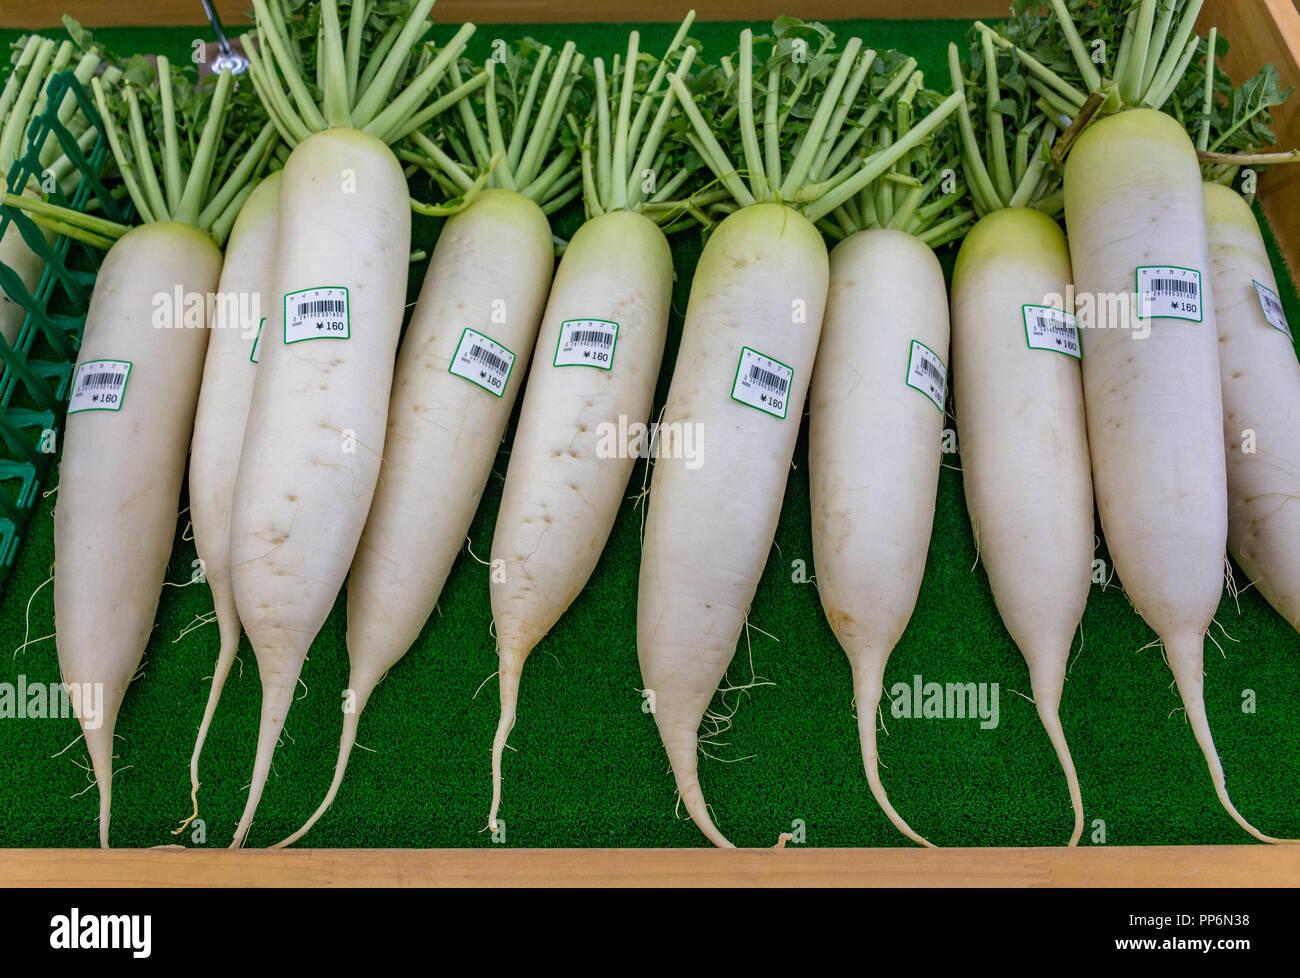 Daikon radish on sale at market, Japan - Stock Image